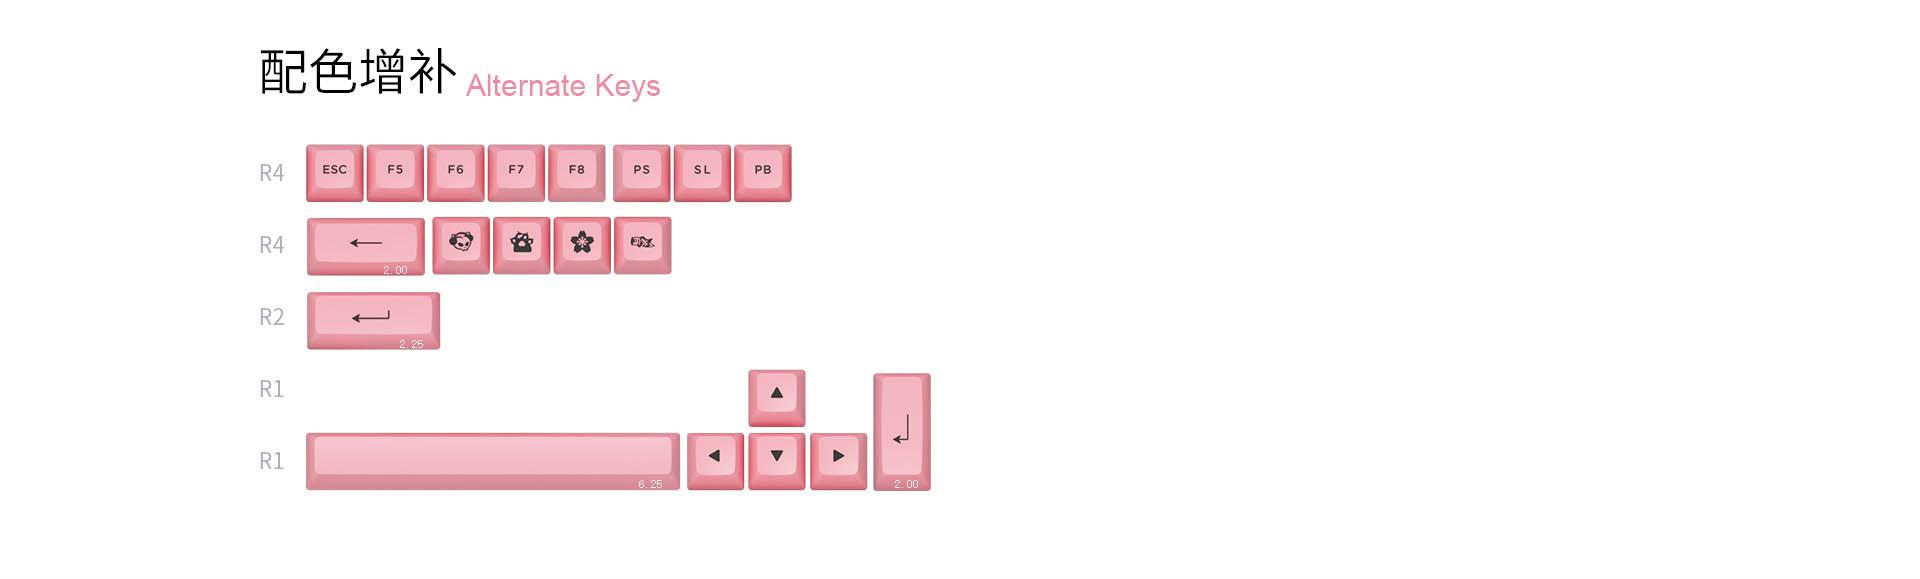 akko-keycap-setblack-pink-pbt-double-shot-asa-profile-158-nut-08